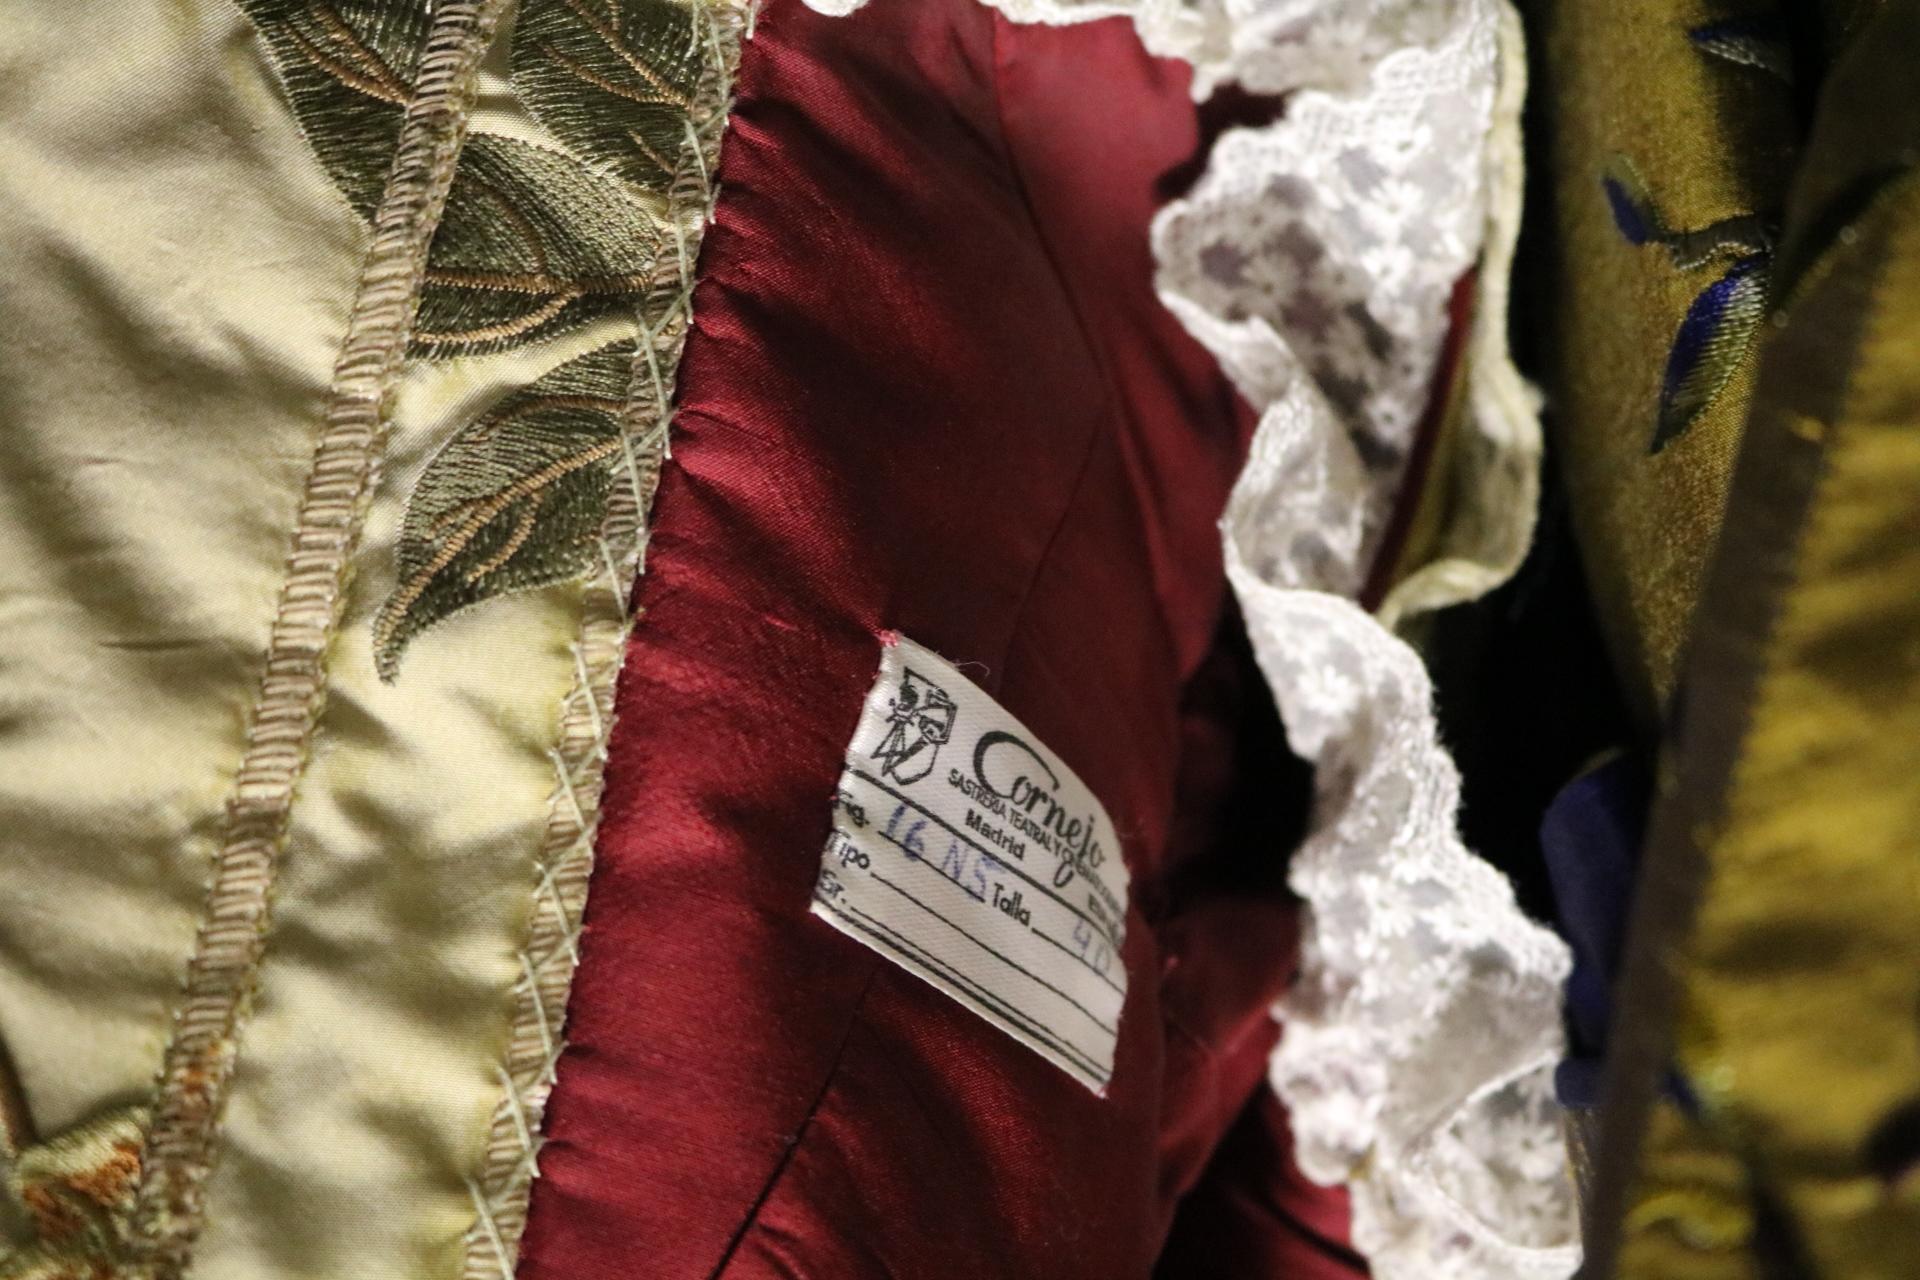 Etiqueta ropa de Sastrería Cornejo